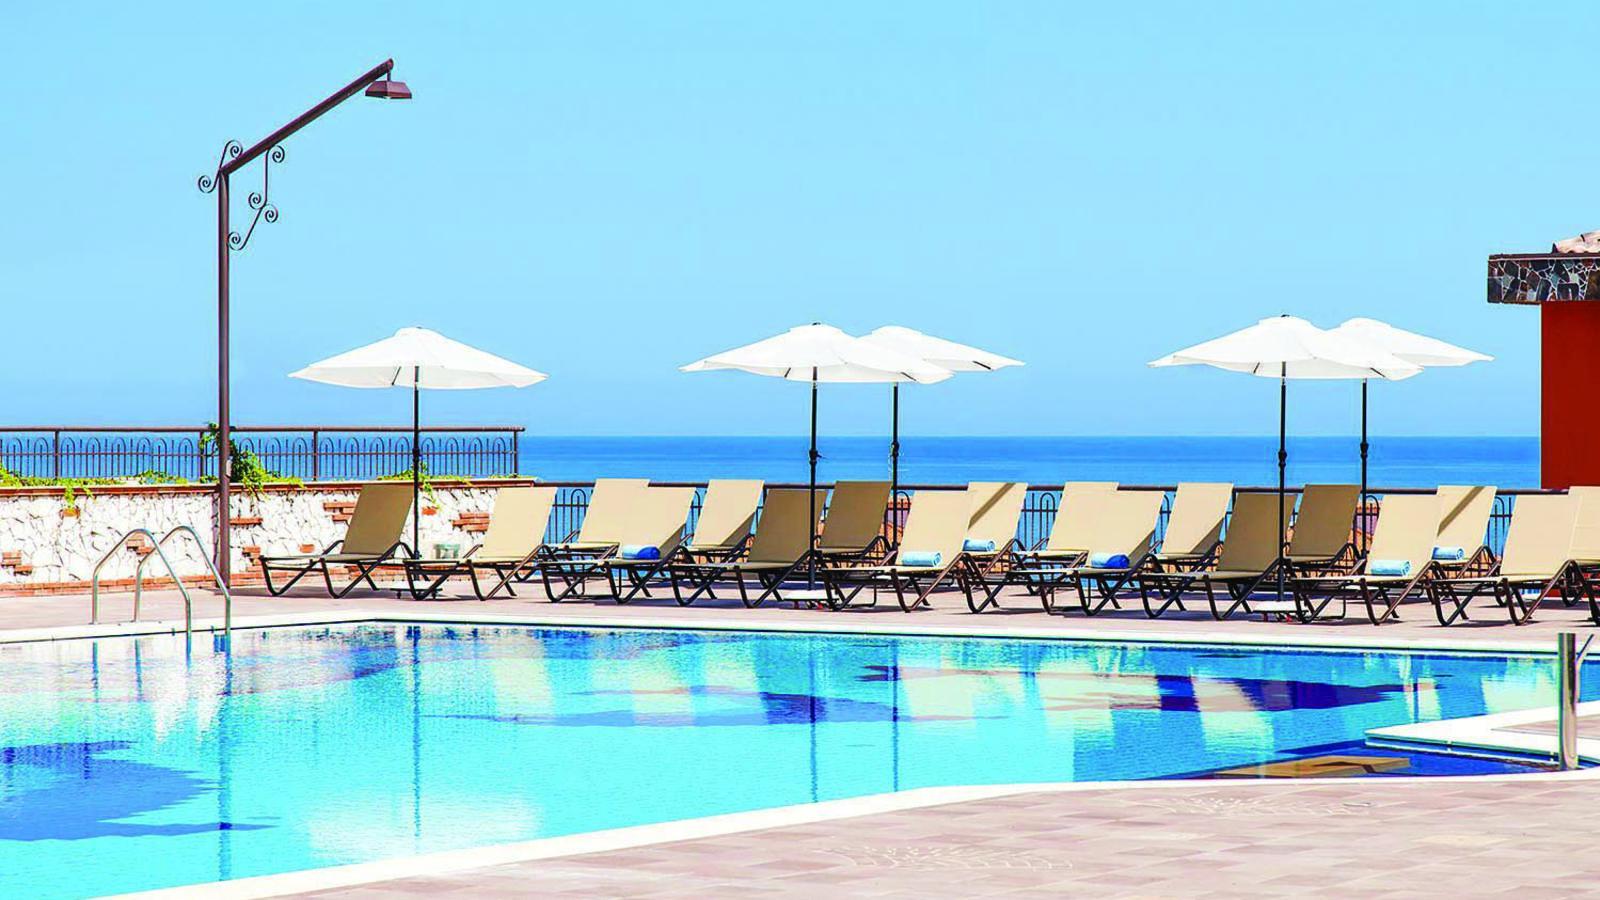 5 hotel diamond giardini naxos topflight sicily - Hotel ai giardini naxos ...